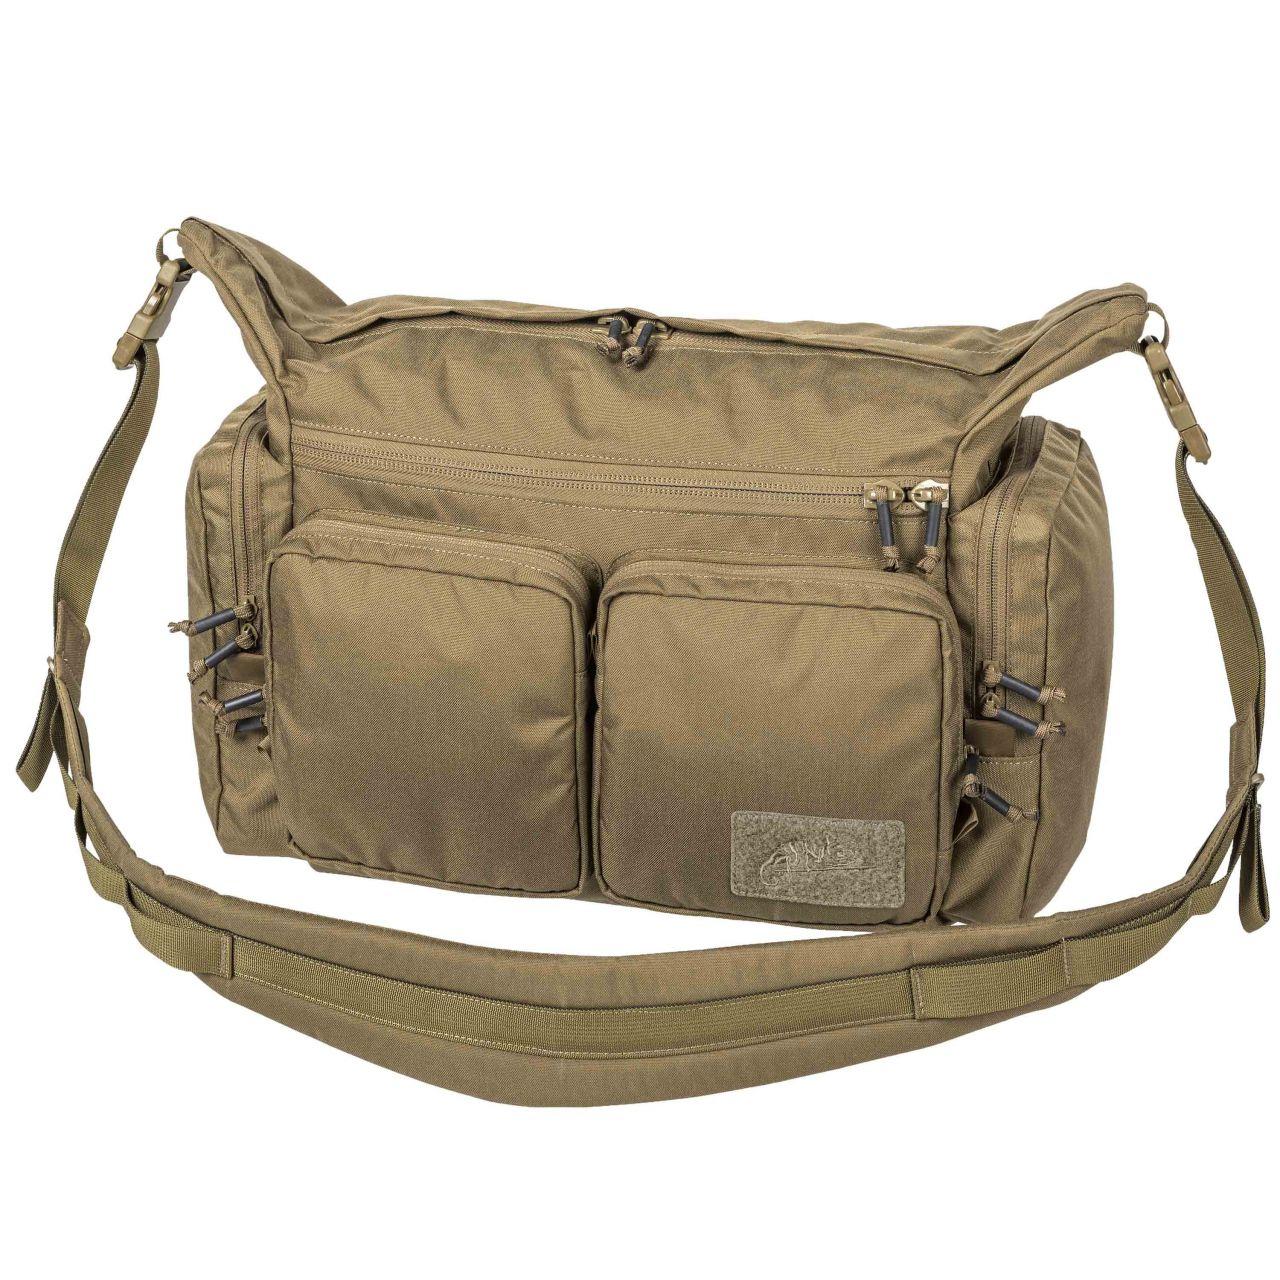 Bolsa bandolera Helikon-Tex Wombat MK2 Shoulder Bag coyote